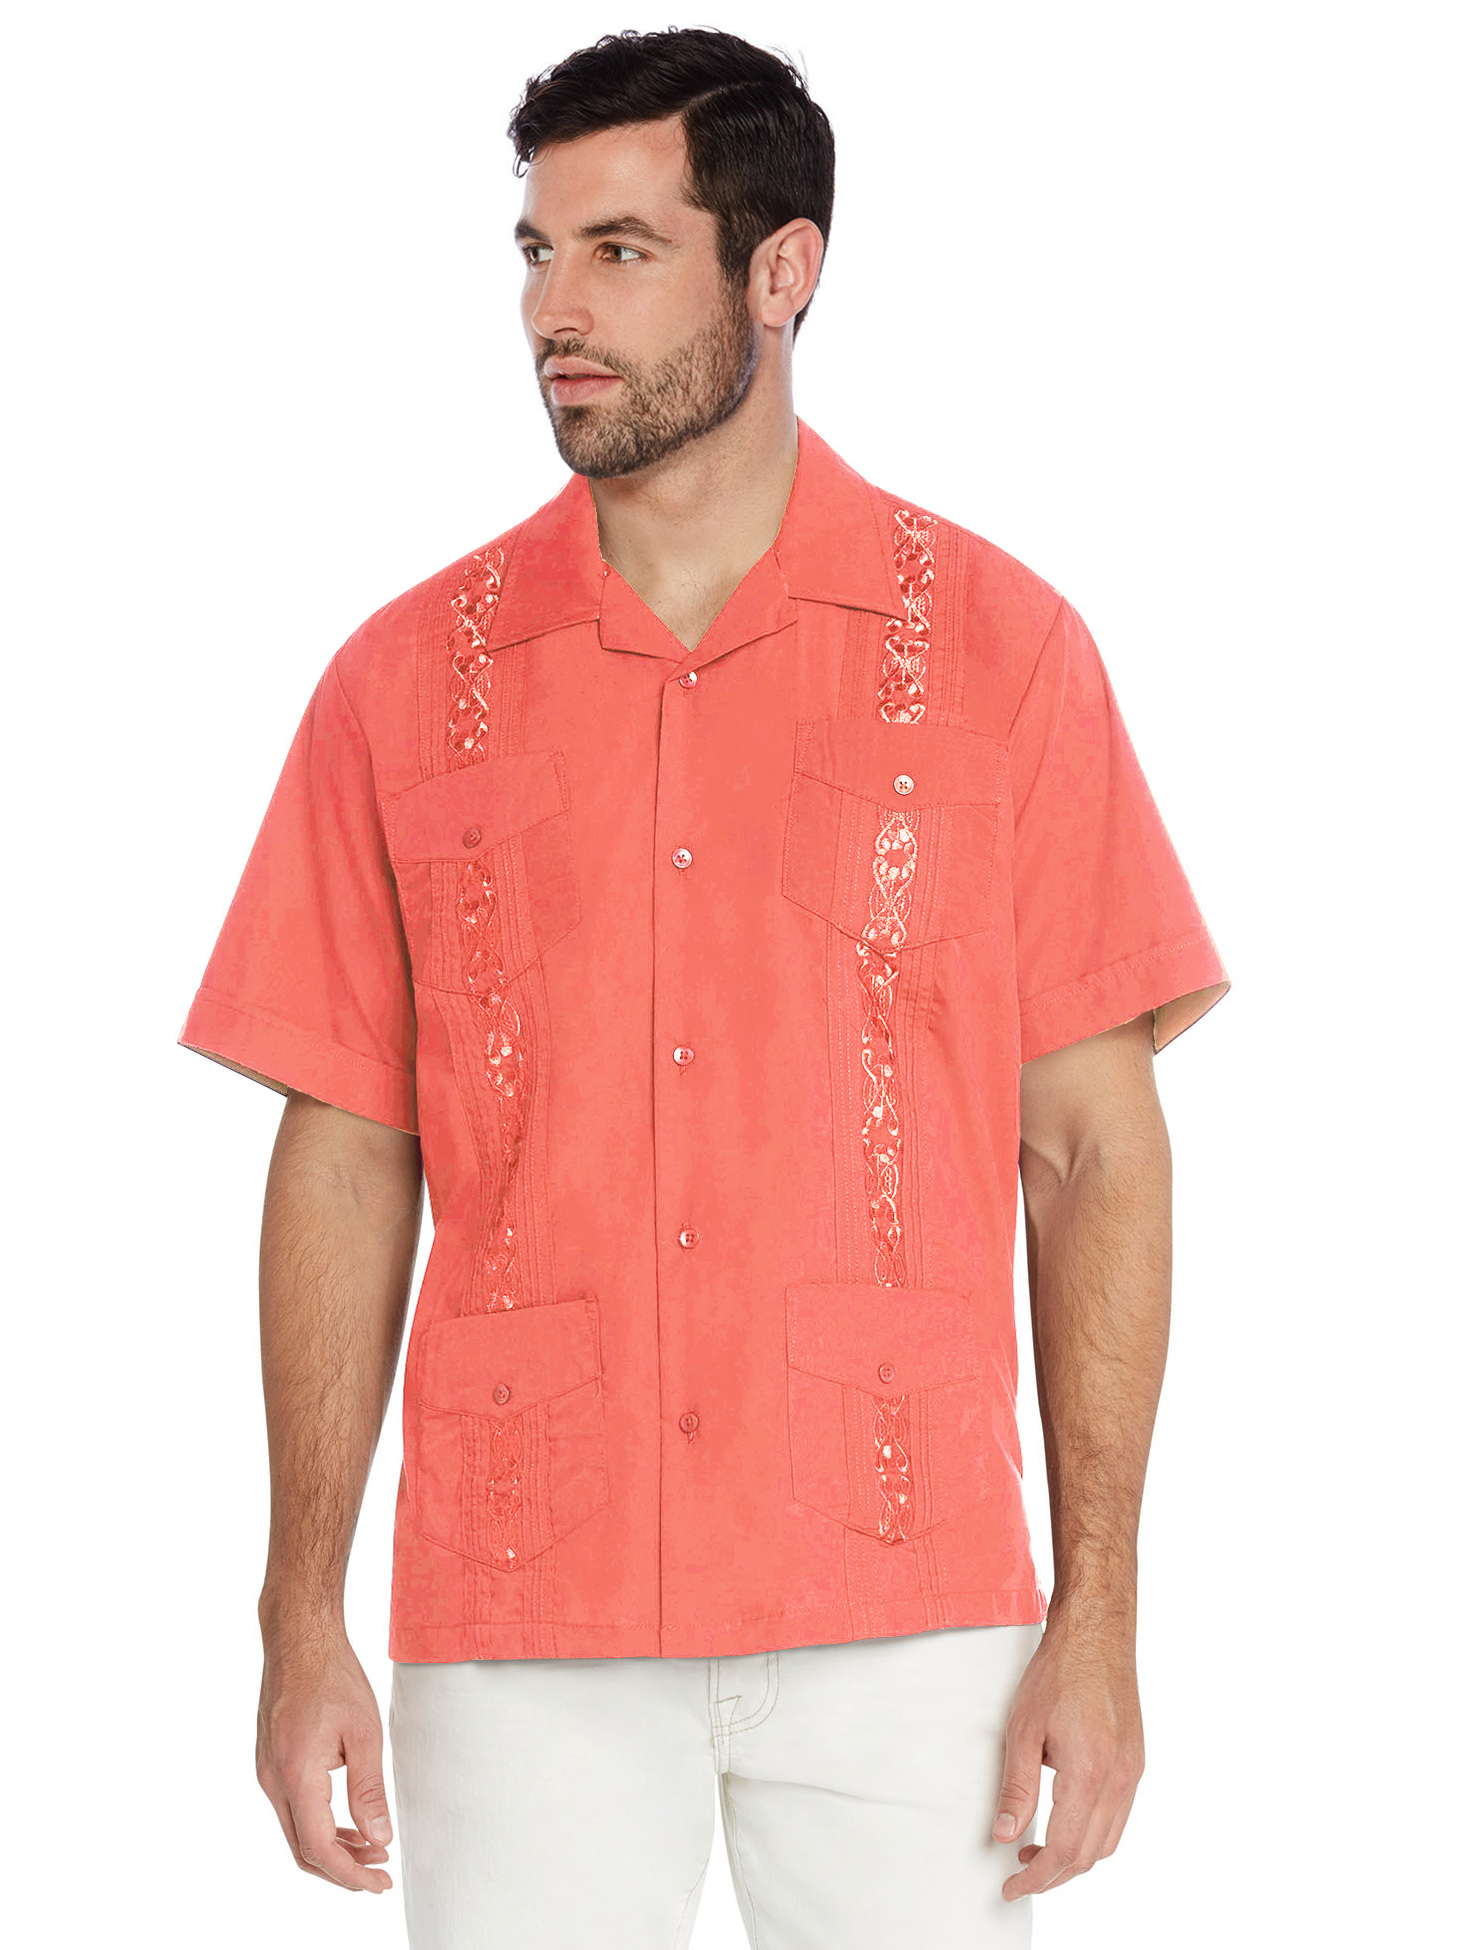 5ecac634 Dress Shirts For Beach Weddings